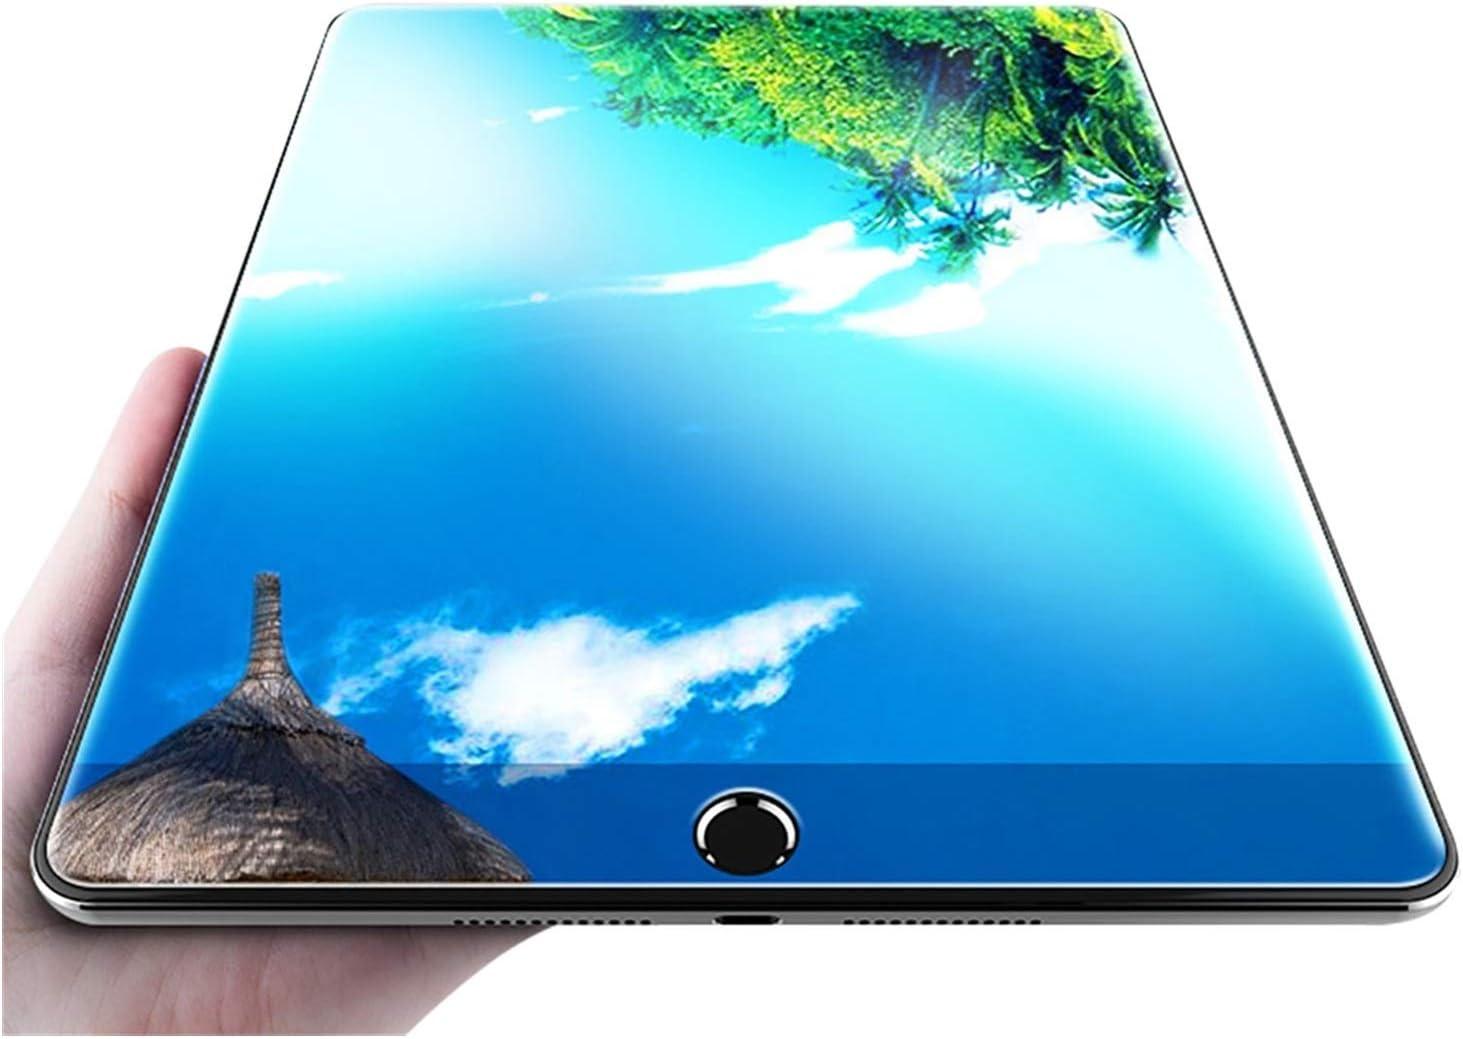 JYBHSH Vidrio Templado for iPad 2017 2018 9.7 Protector de Pantalla for iPad Air 1 2 3 4 5 Película Protectora for iPad Pro 11 2020 10.5 9.7 (Color : For iPad min 1 2 3)